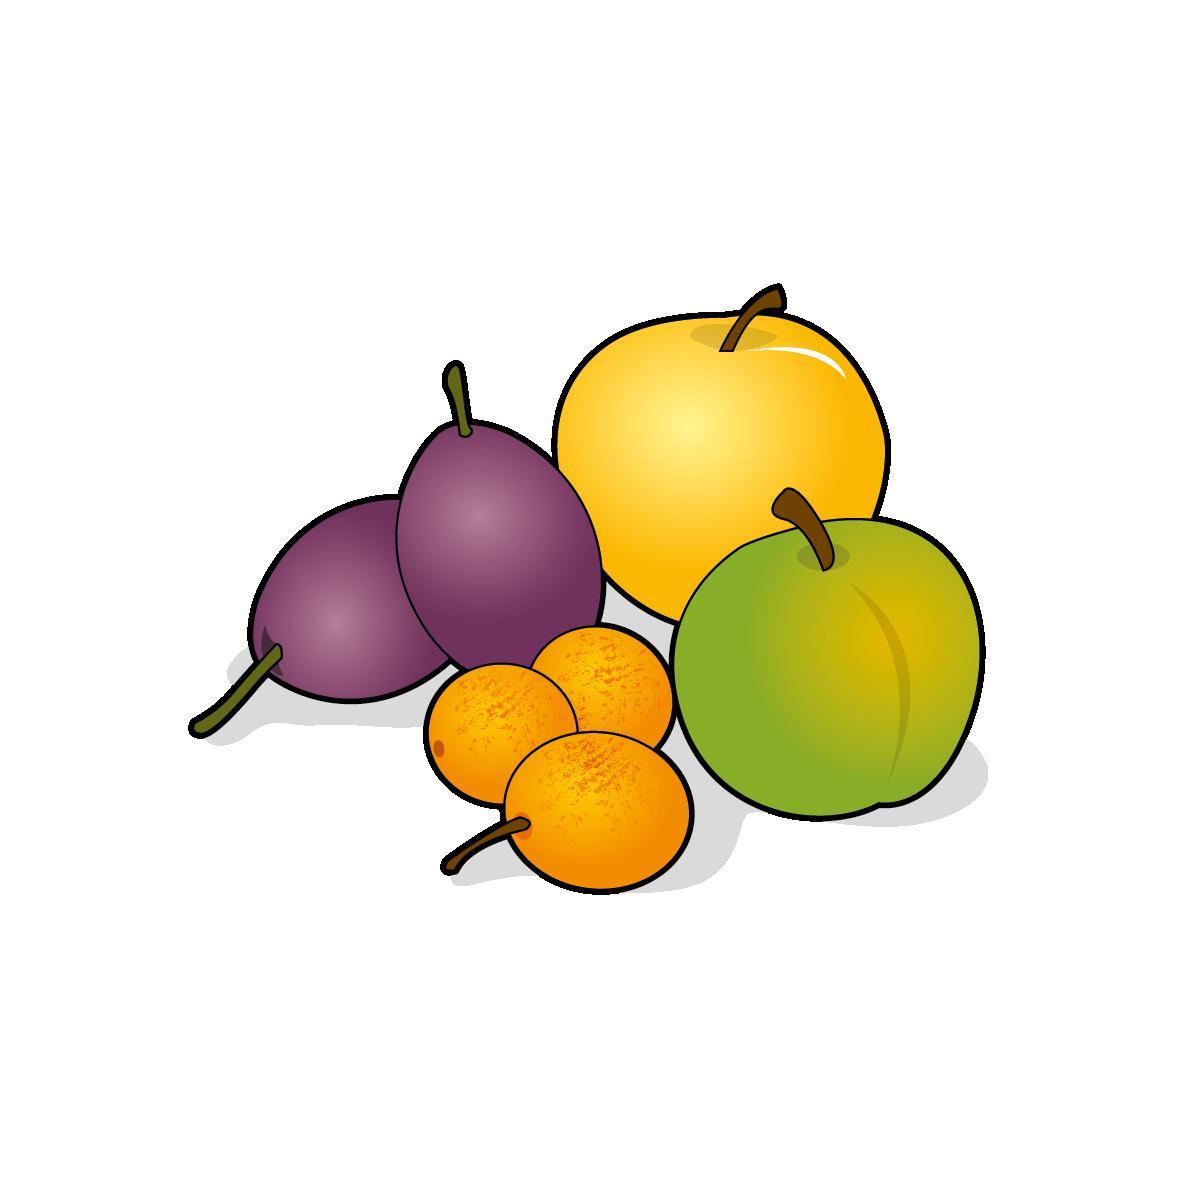 Icone de prunes, ailmacocotte.com